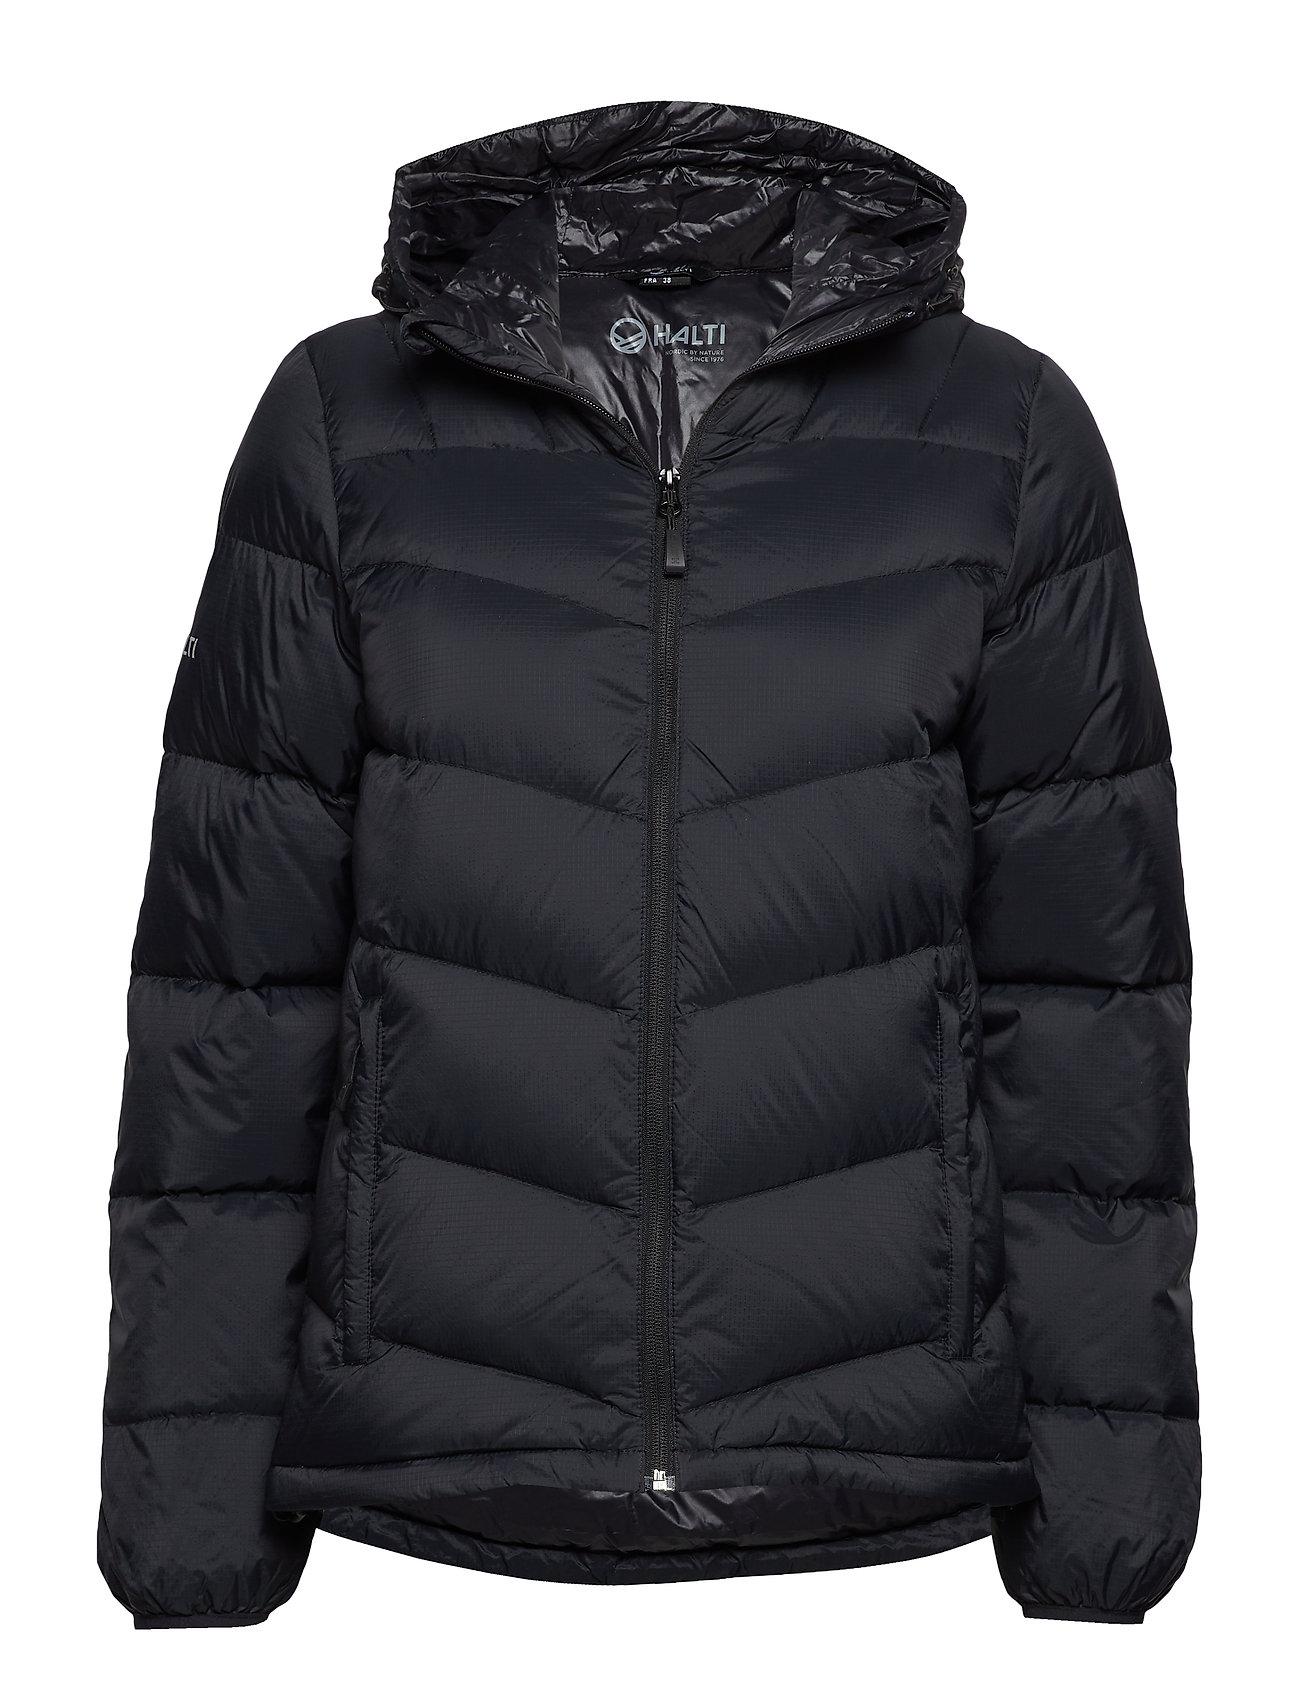 Halti Halle W down jacket